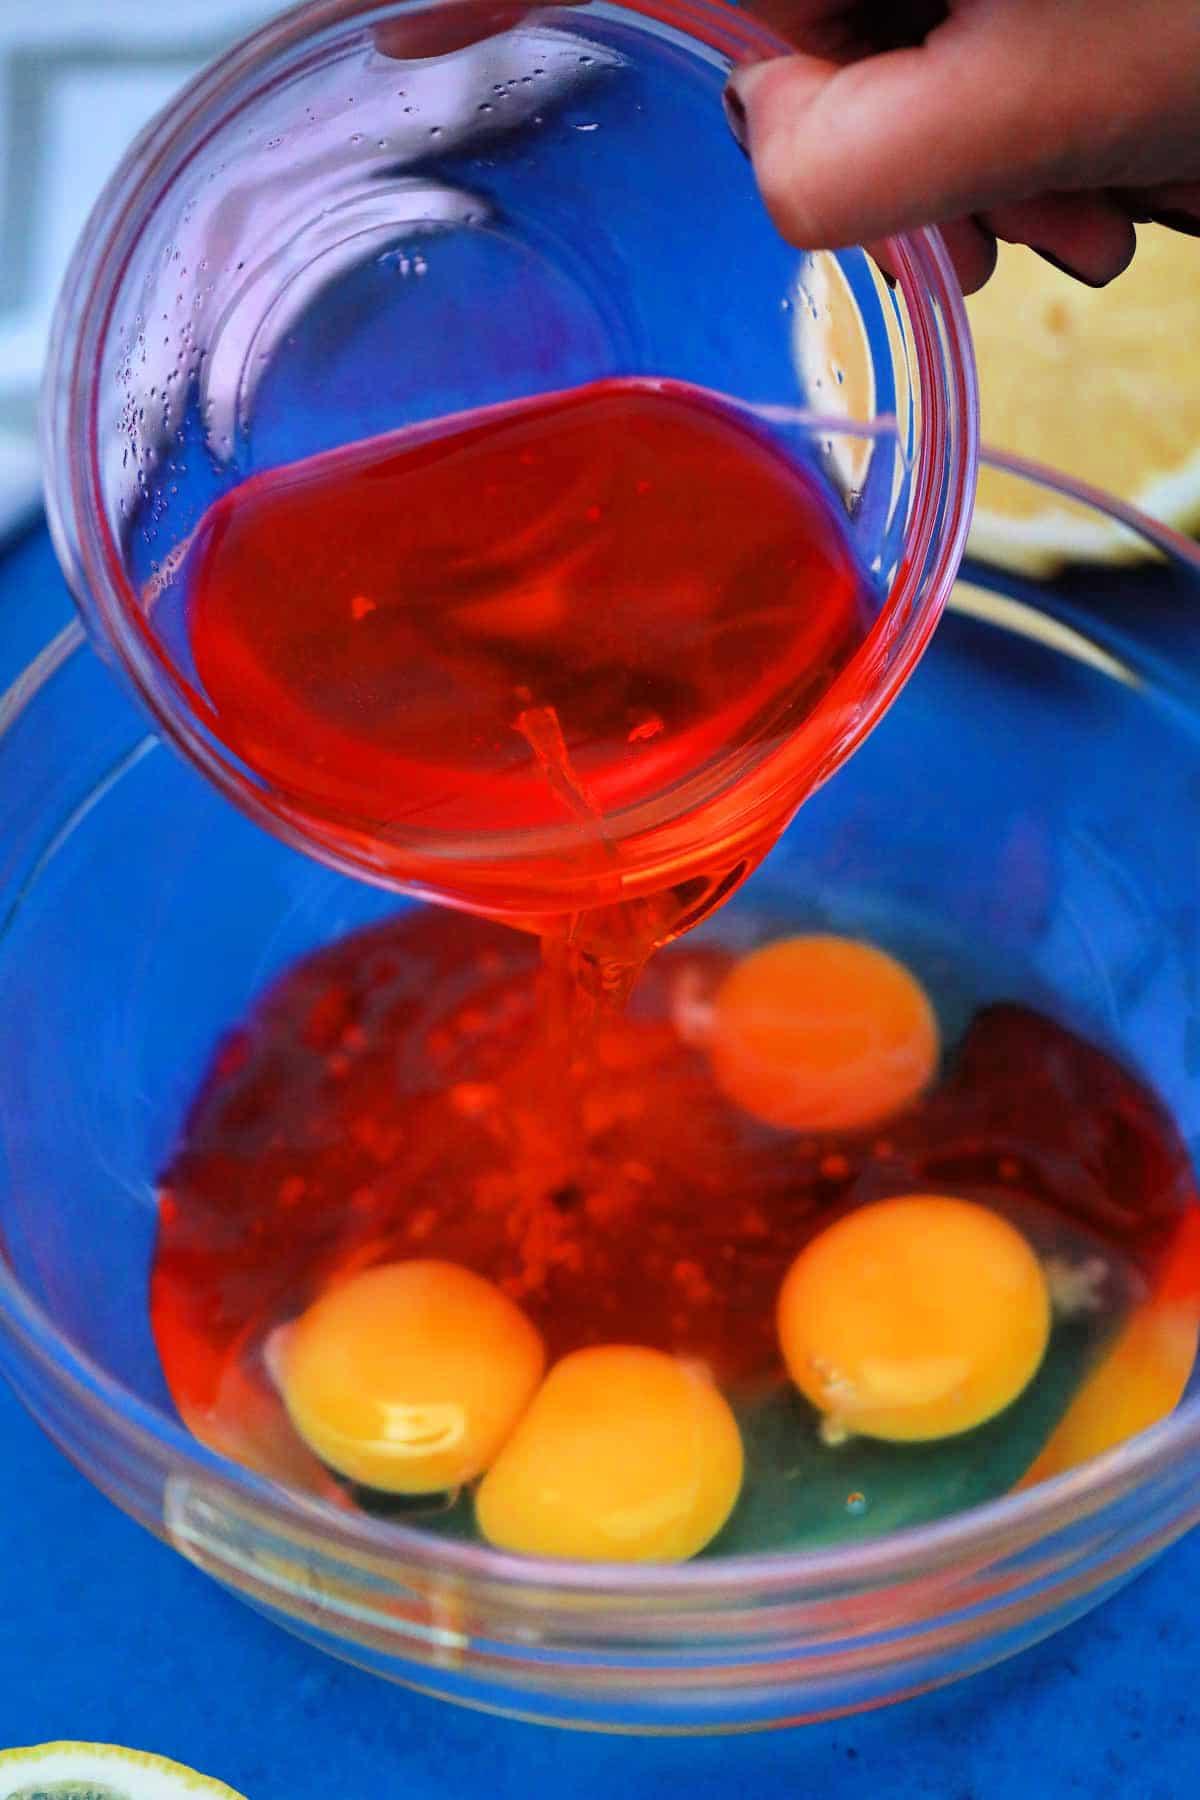 Adding pinkl emonade to eggs